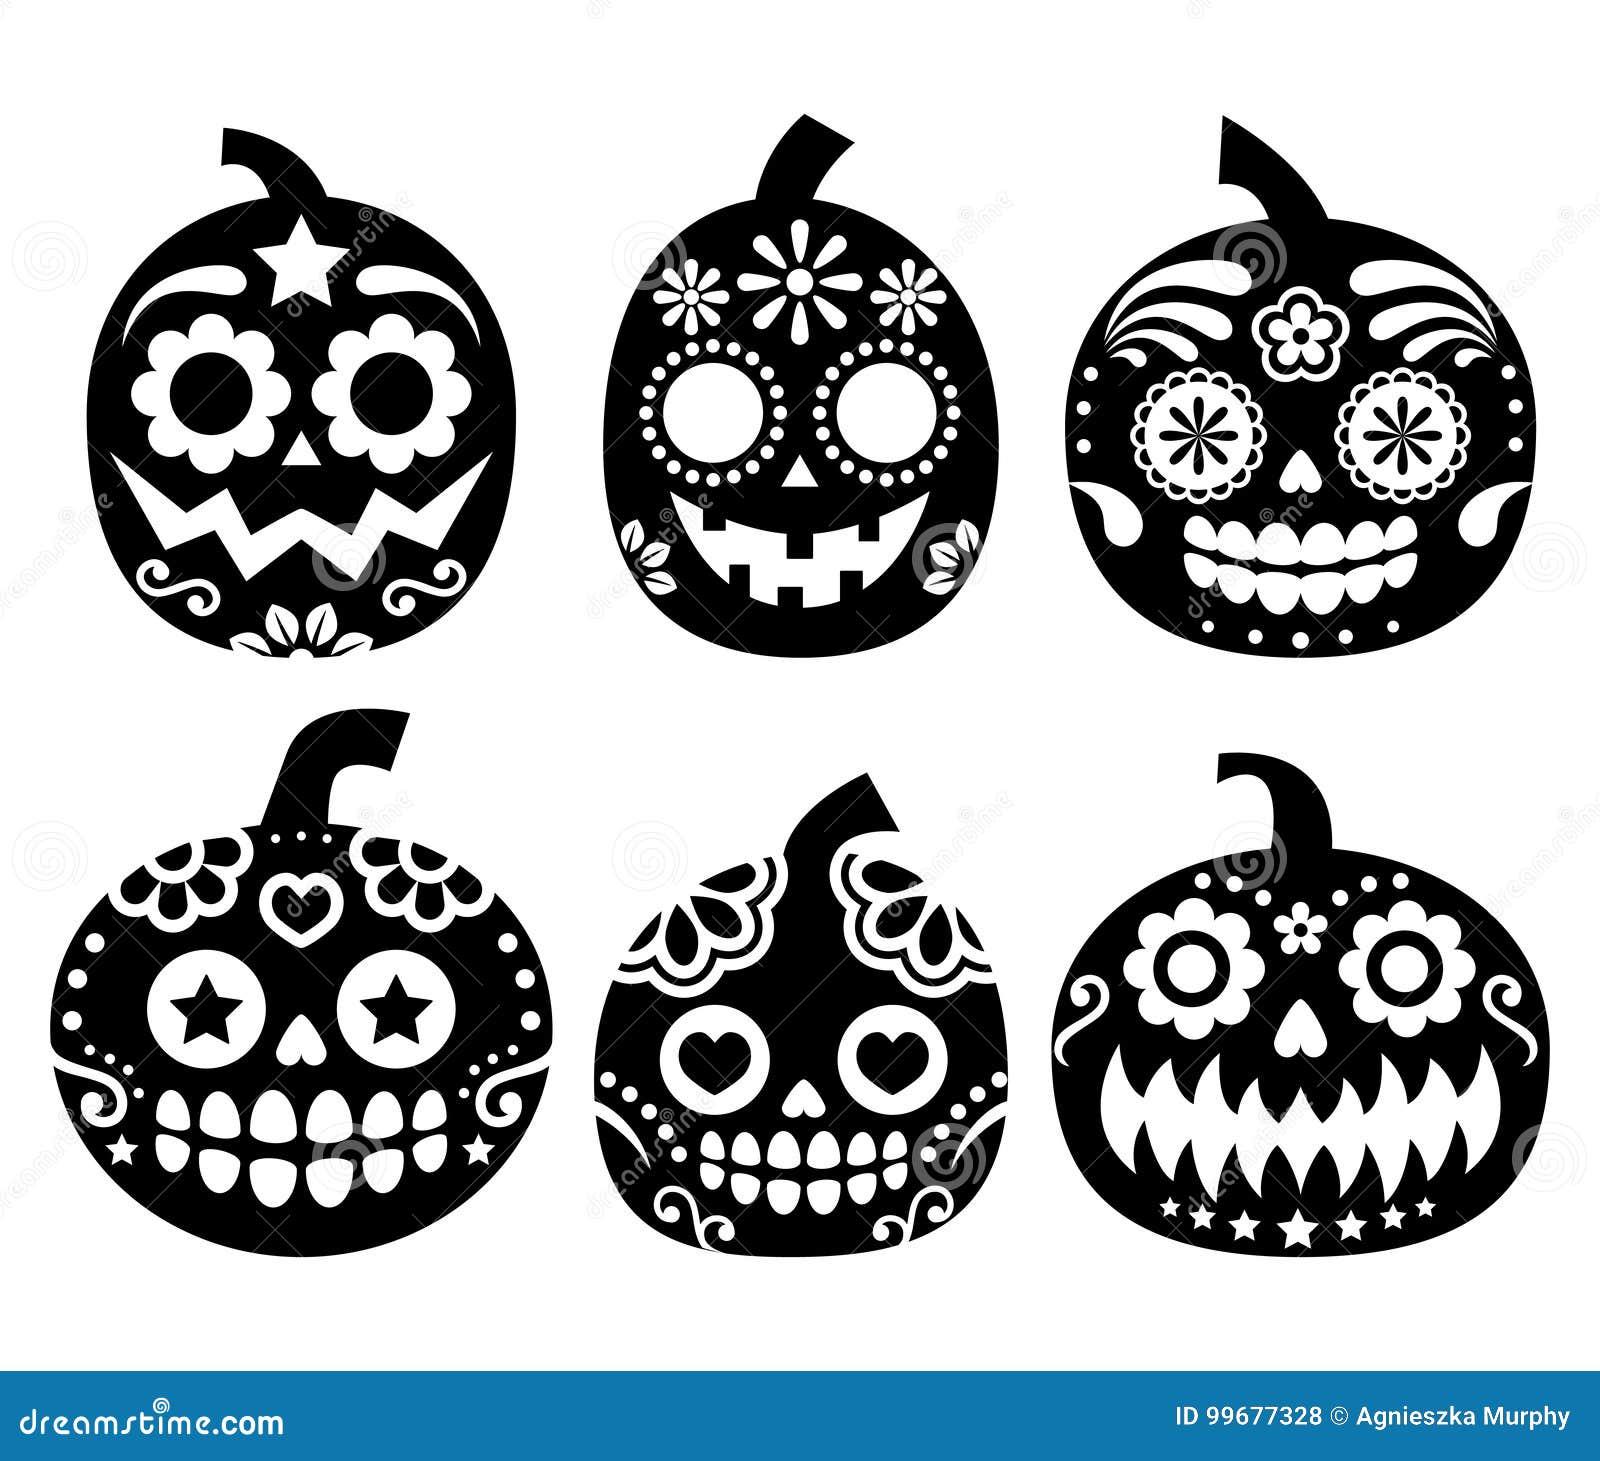 Halloween Pumpkin Vector Design Mexican Sugar Skull